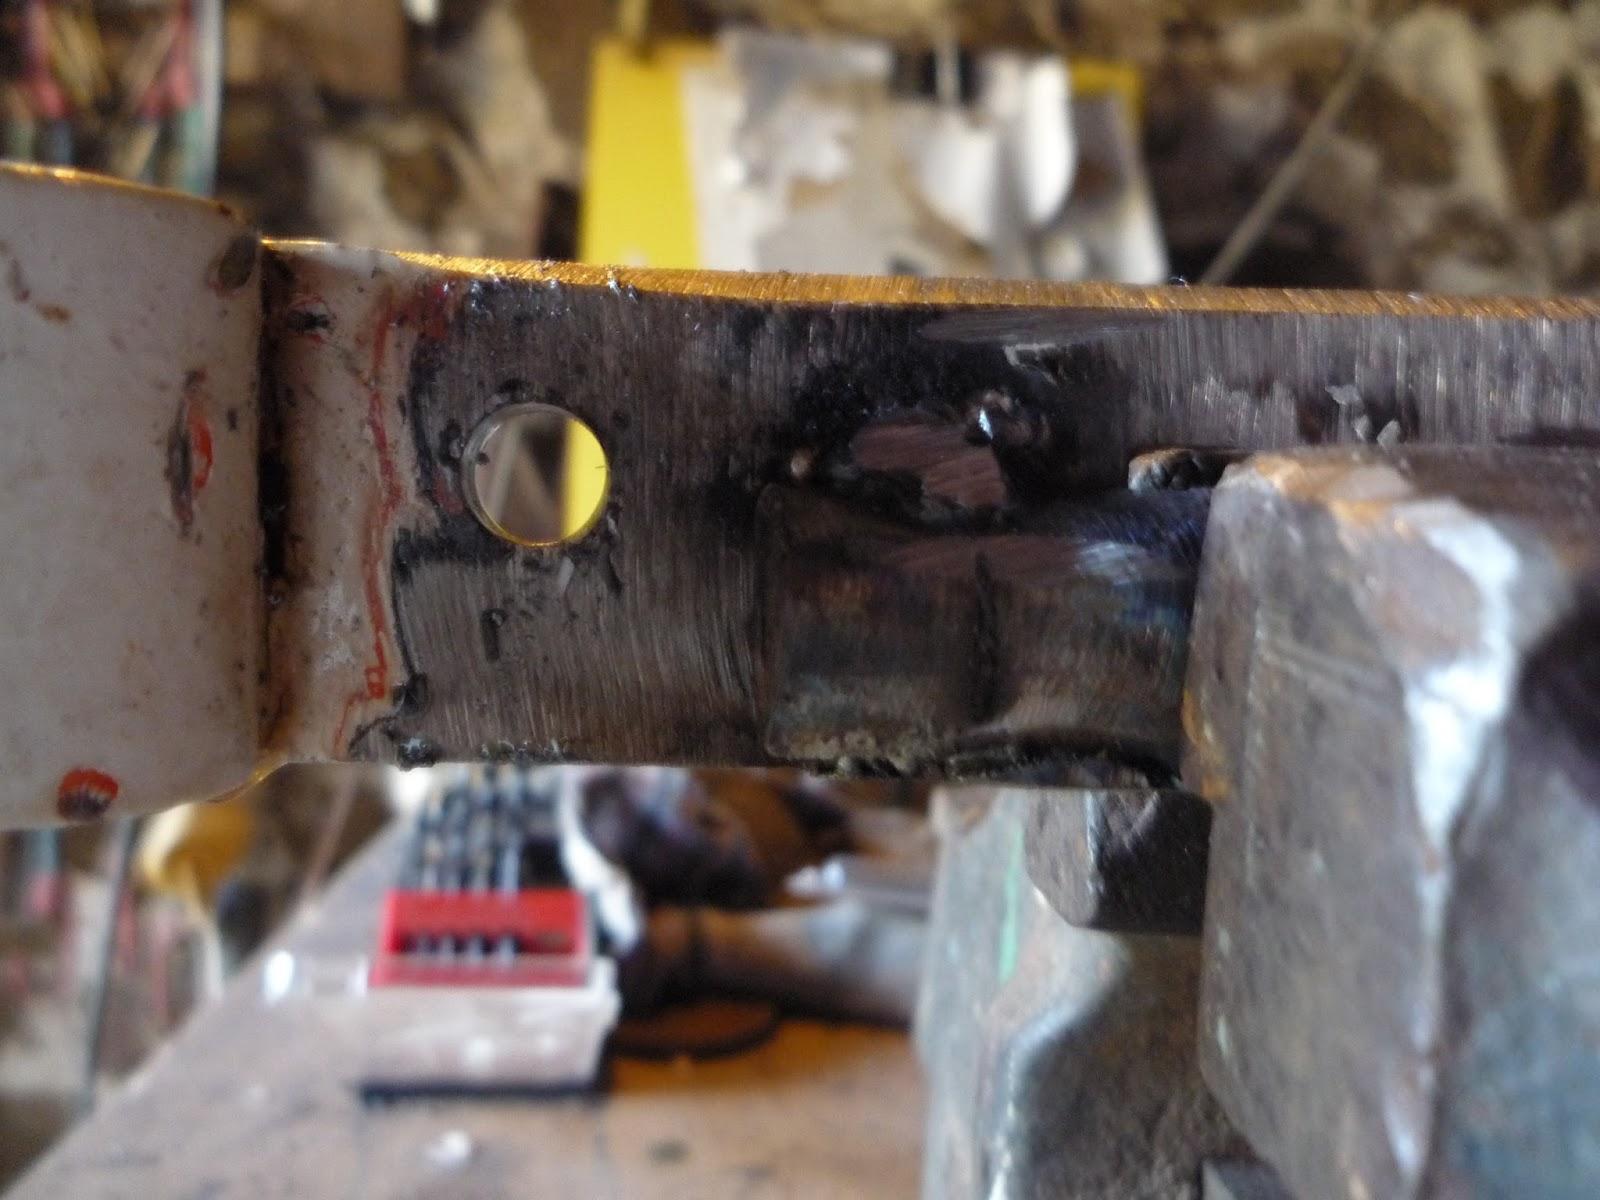 work in progress DIY guillotine